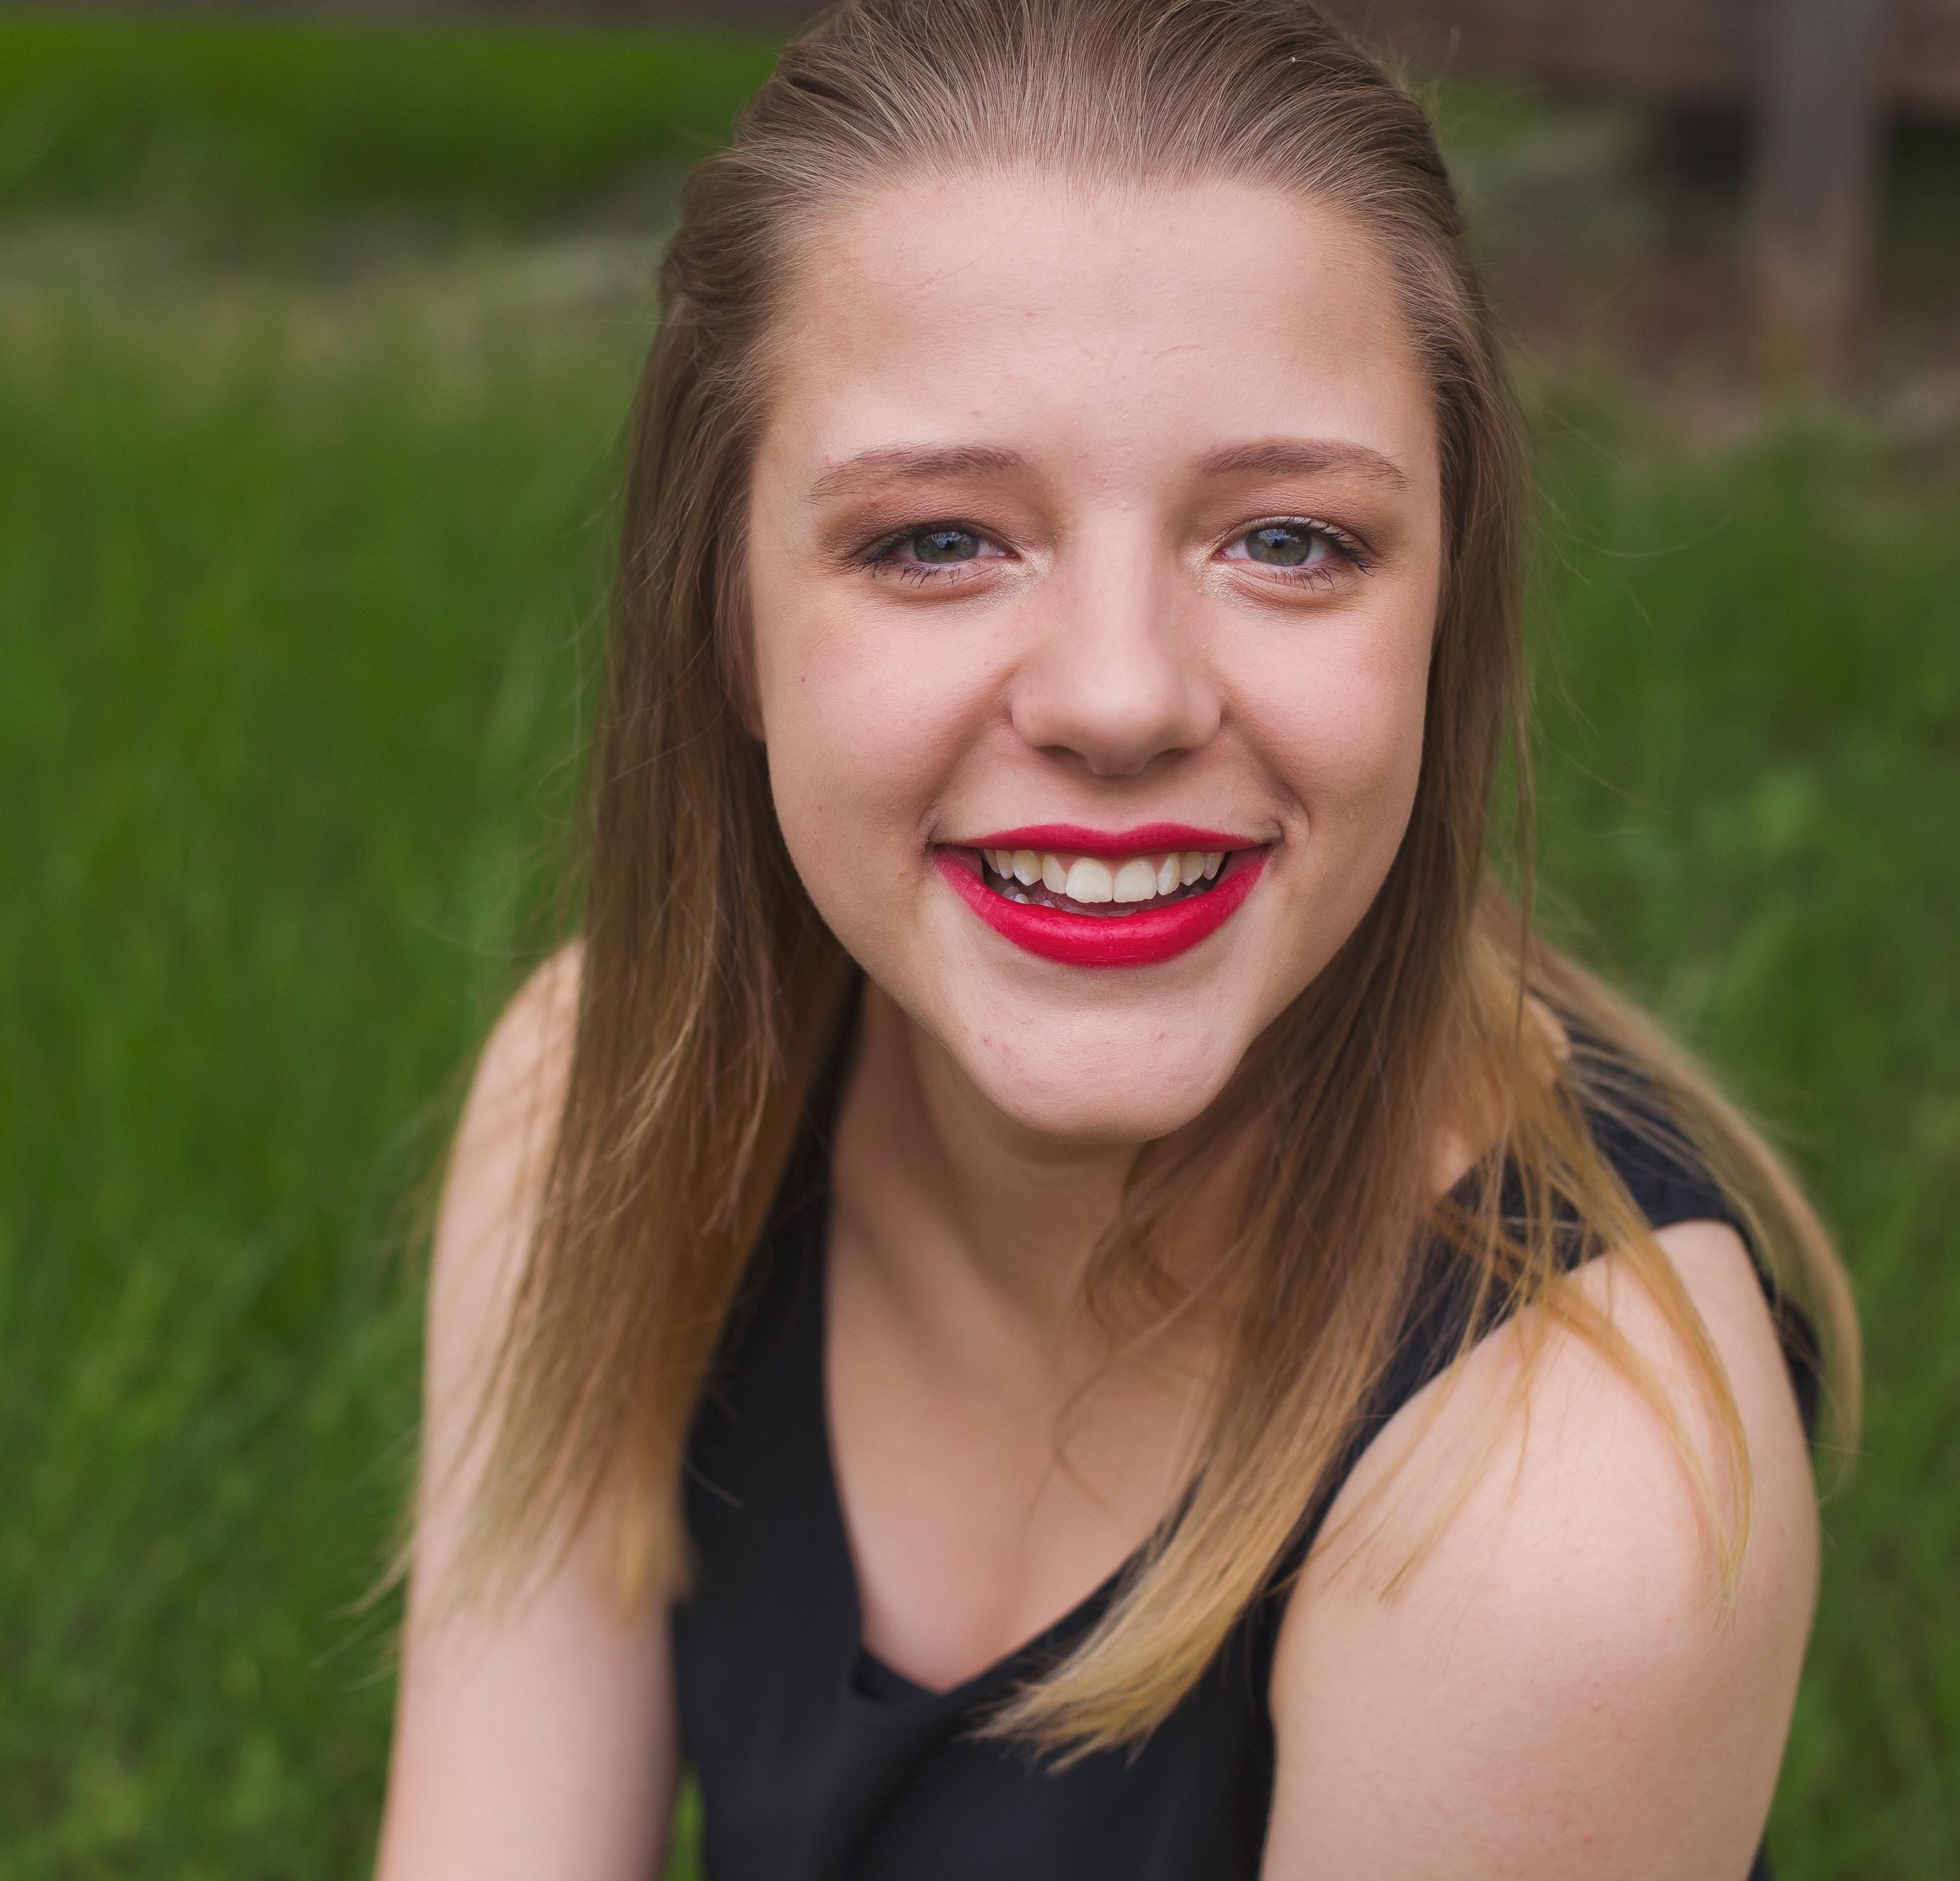 Ashlynn denton ballet academy